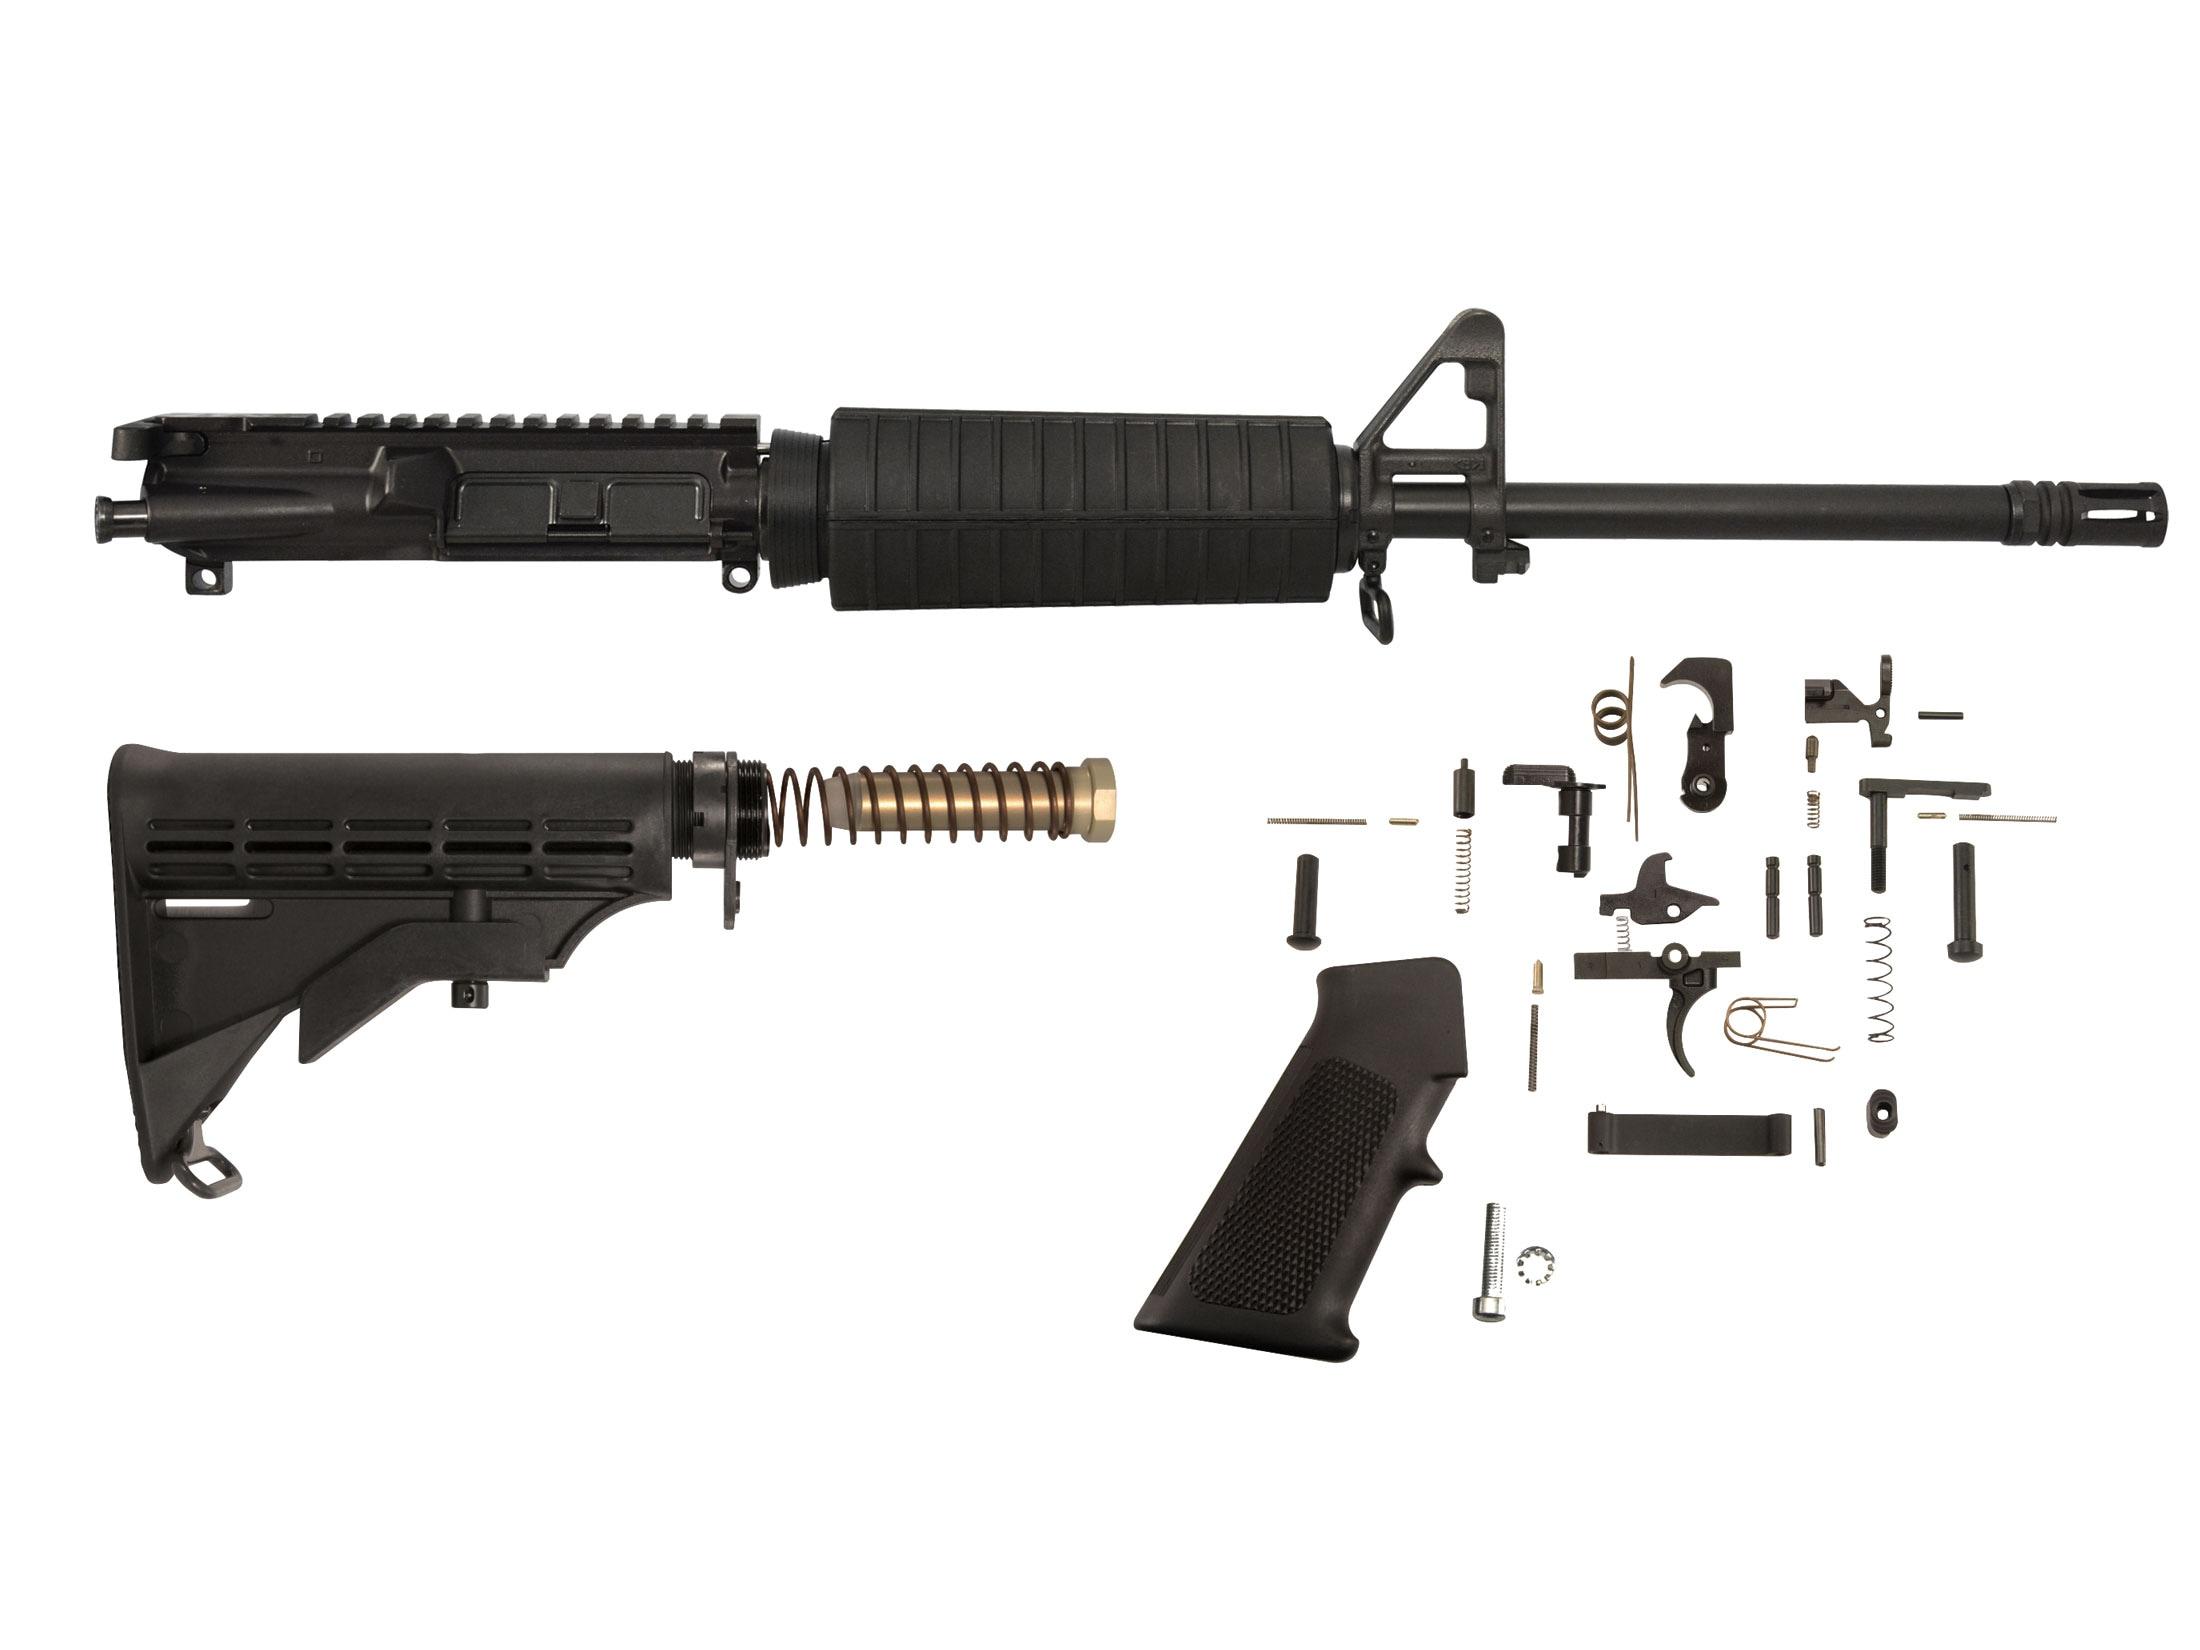 AR-STONER AR-15 Carbine Kit Complete Upper Assembly 7 62x39mm 1 10